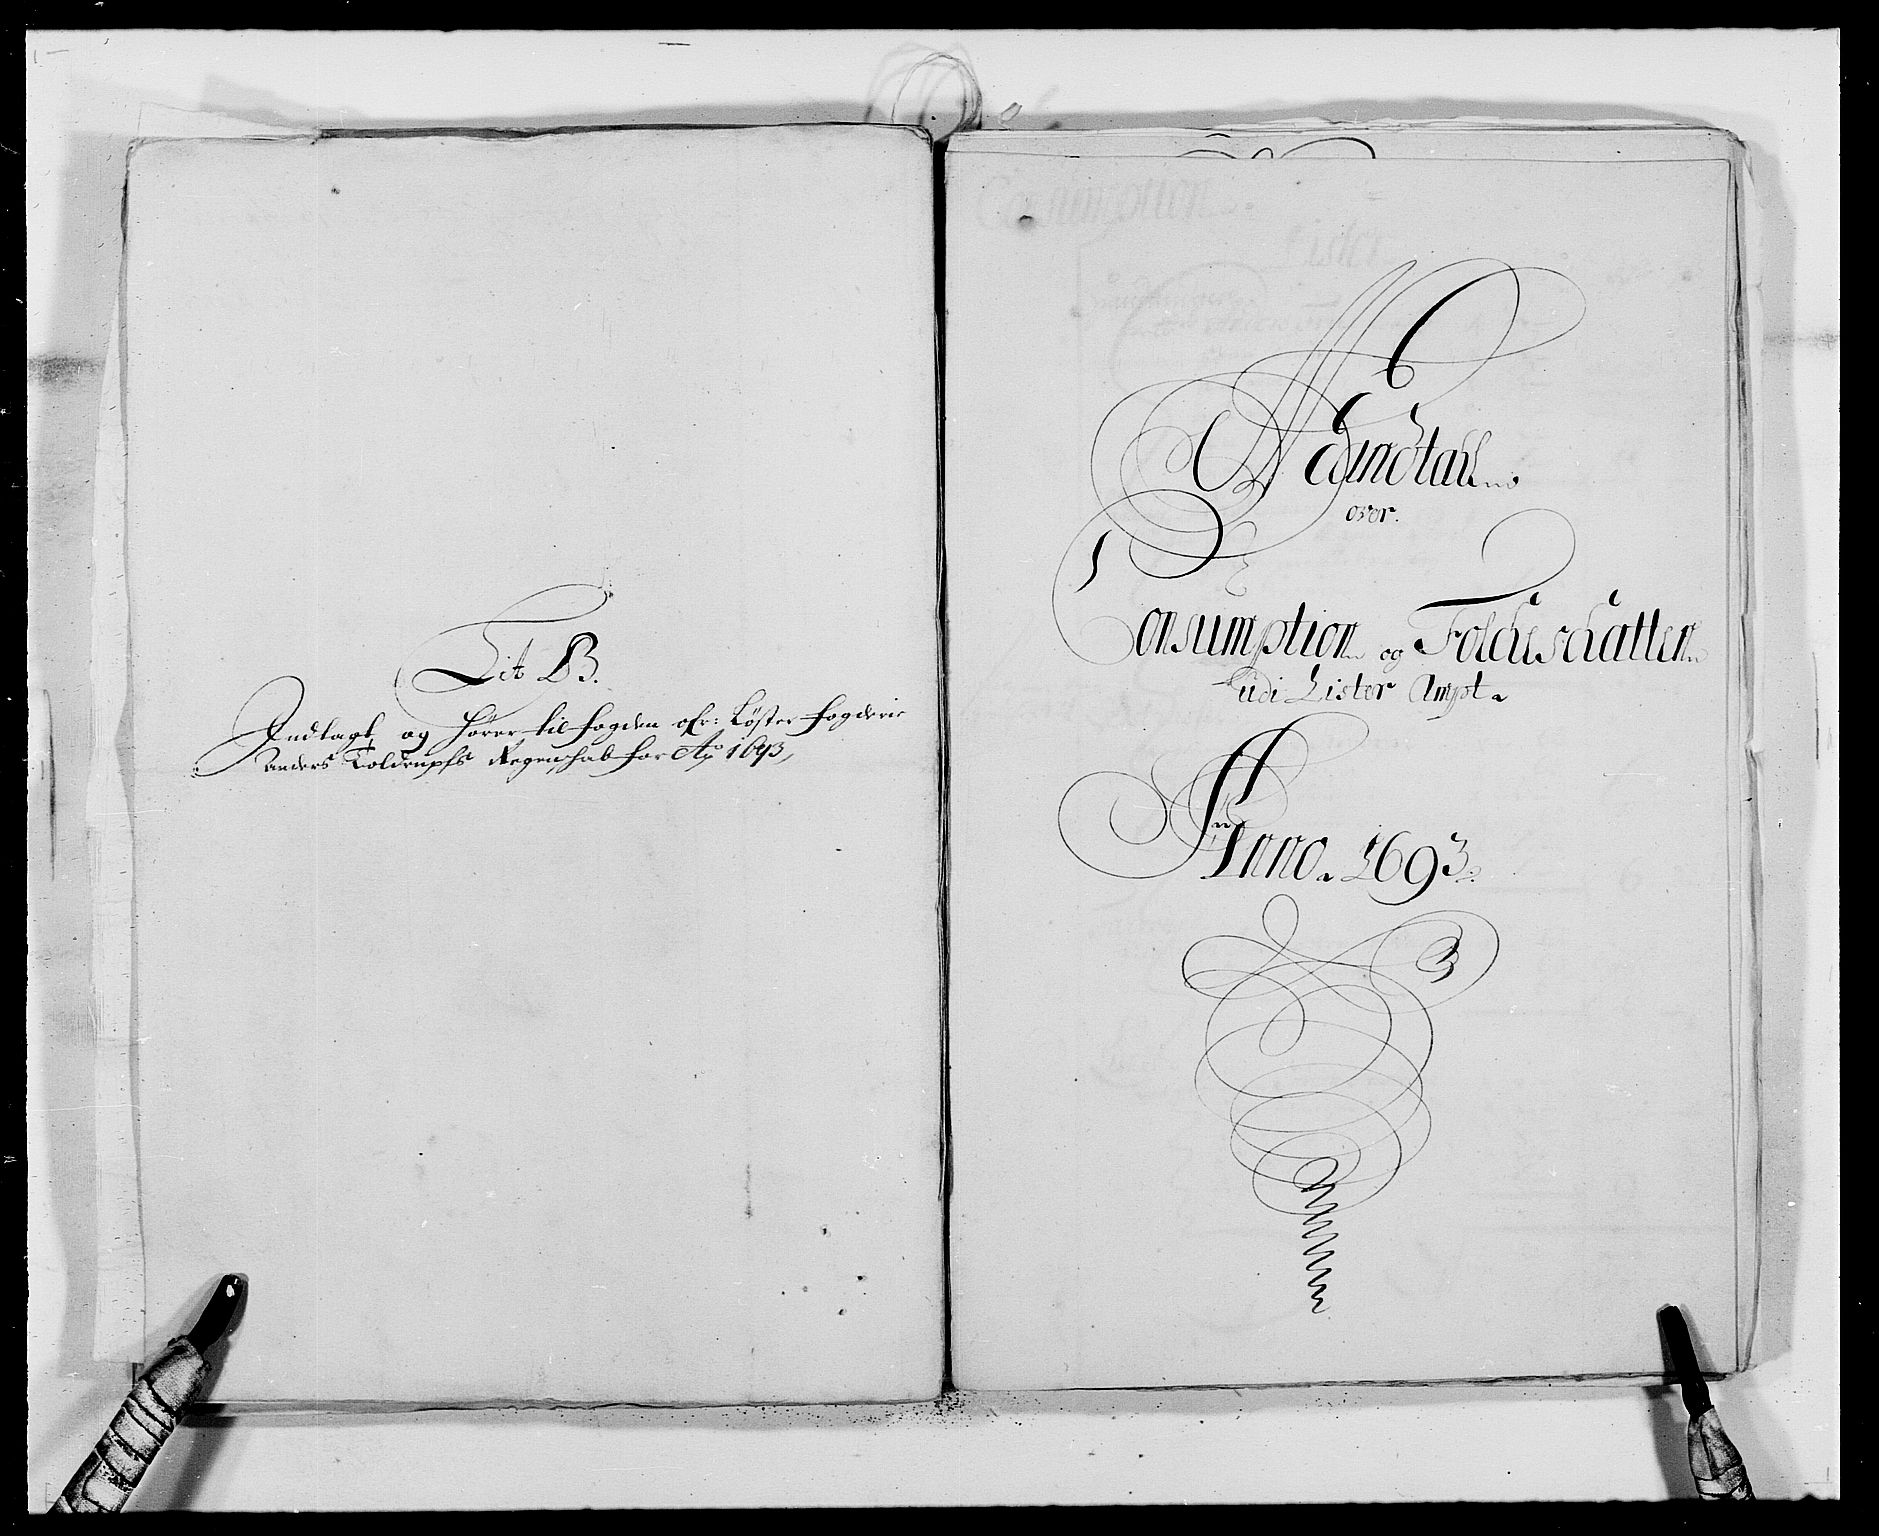 RA, Rentekammeret inntil 1814, Reviderte regnskaper, Fogderegnskap, R41/L2536: Fogderegnskap Lista, 1690-1693, s. 442